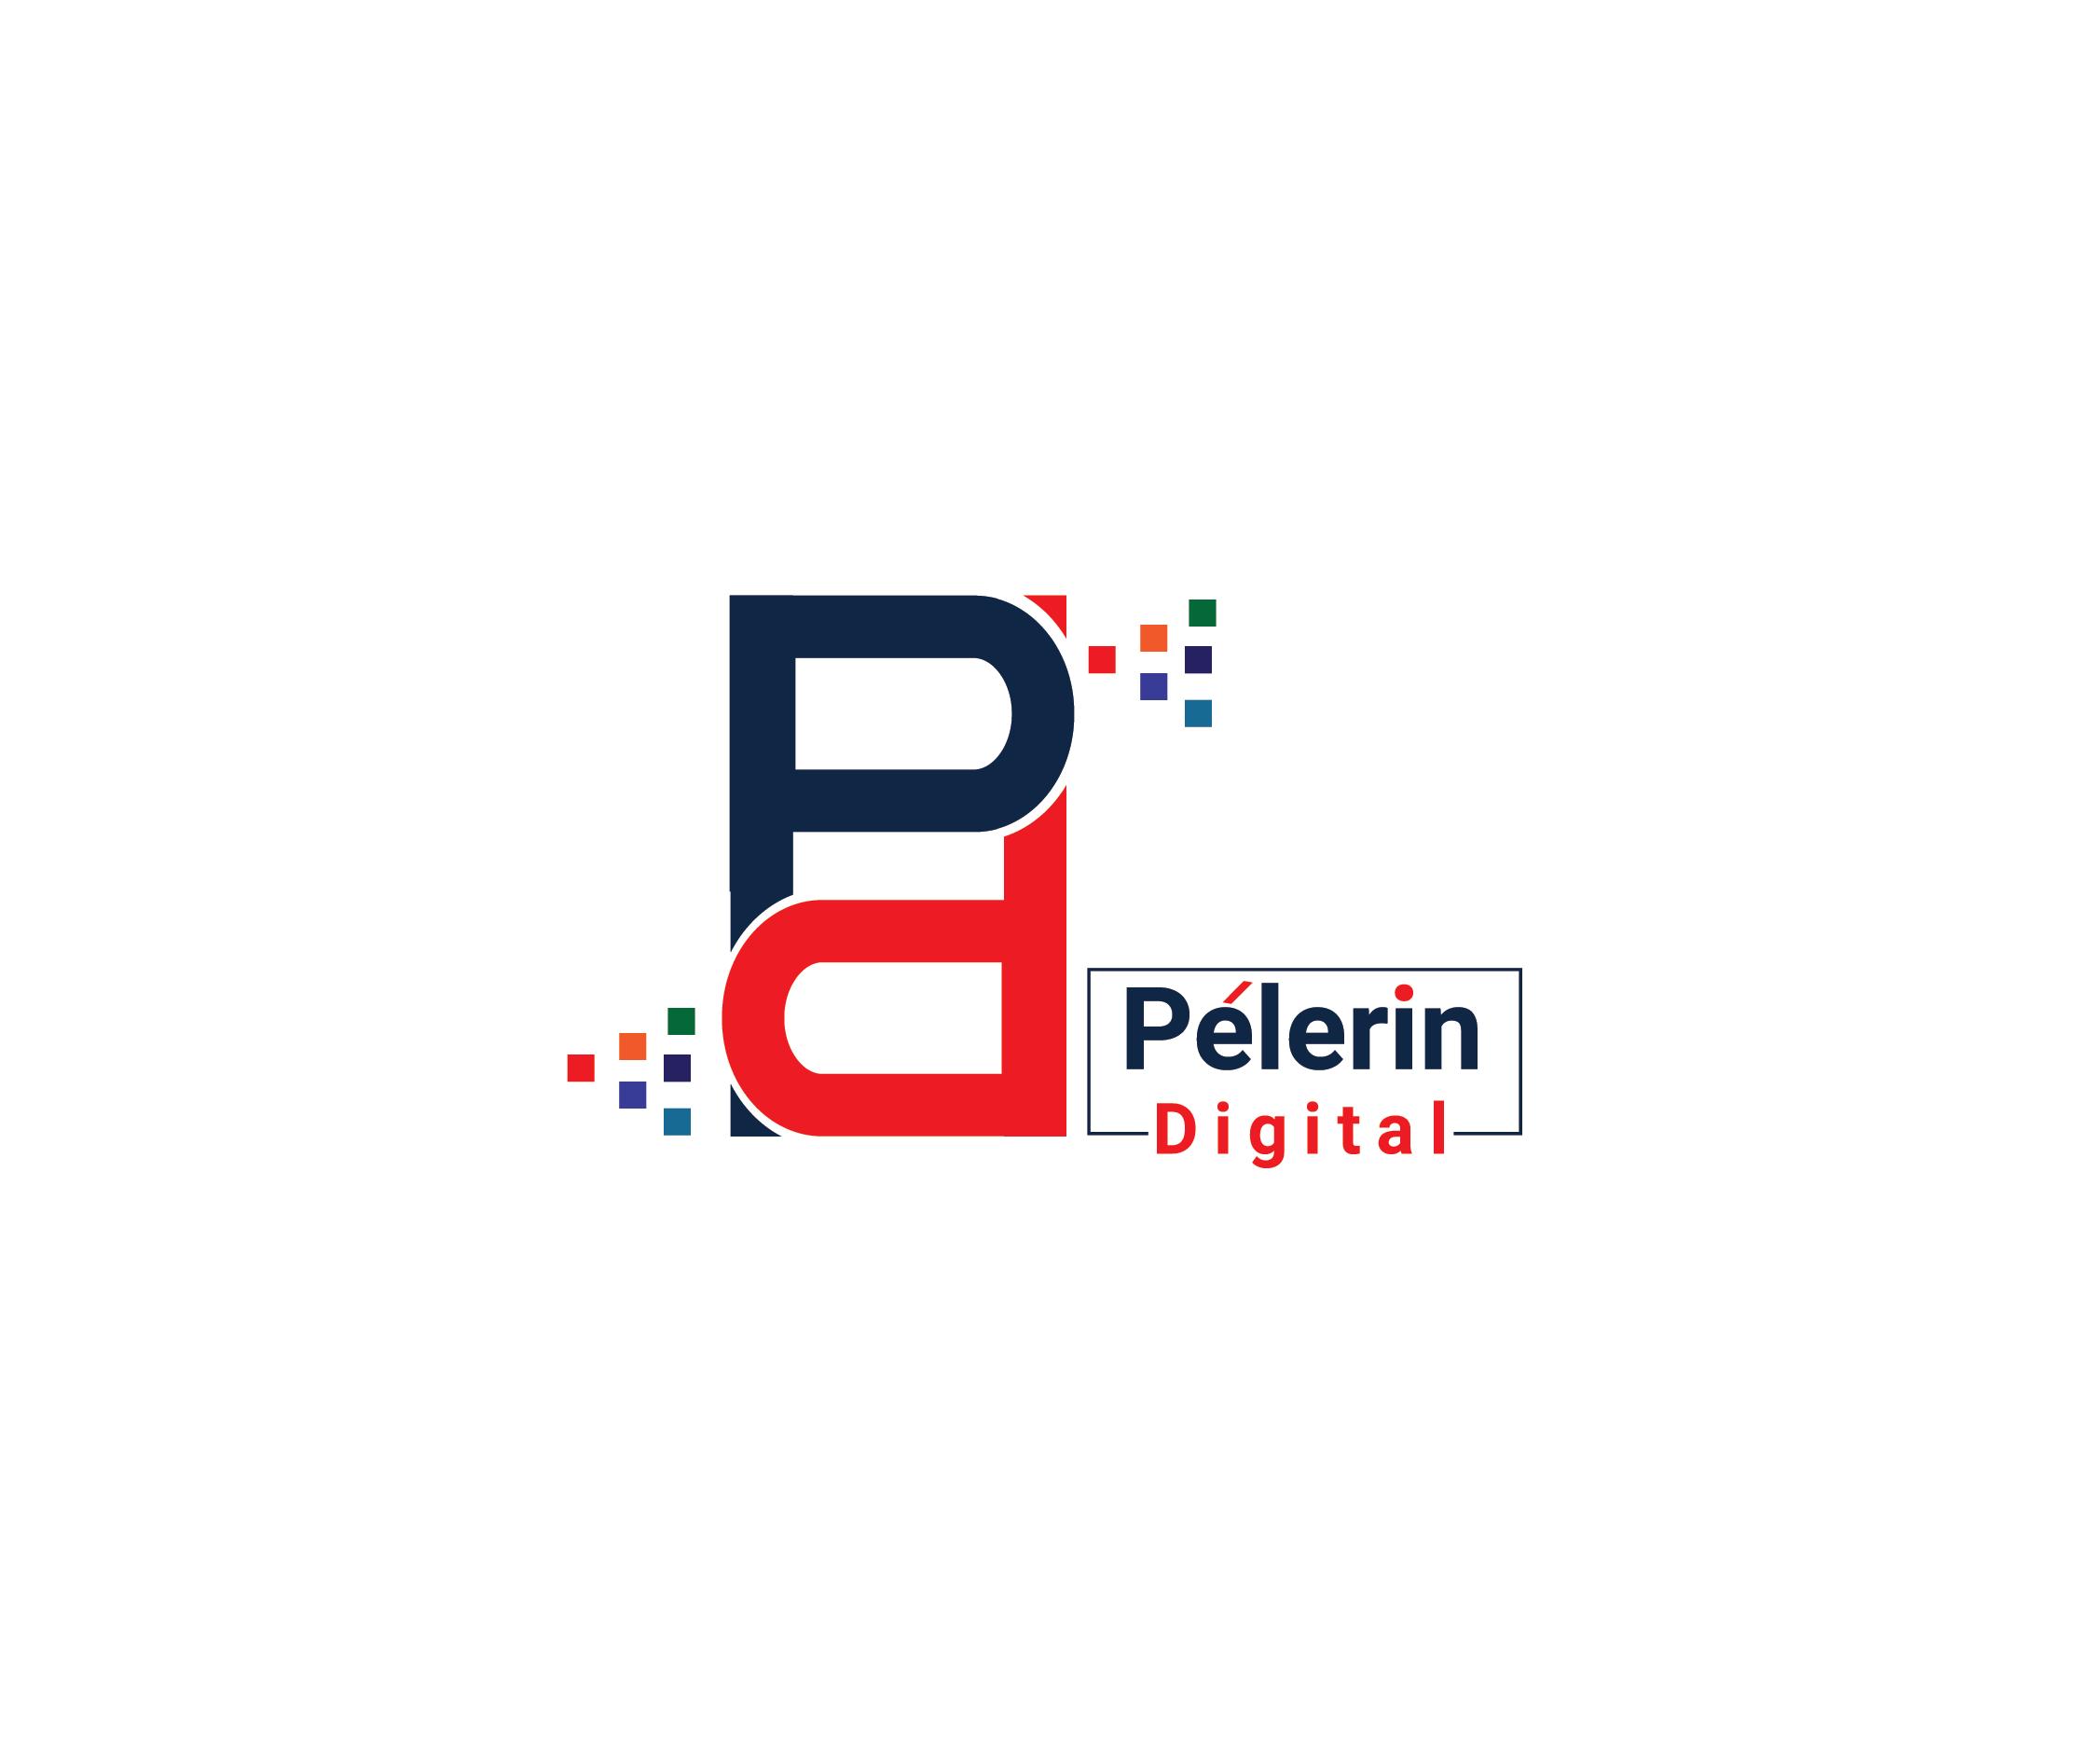 I will design modern logo within 6 hours